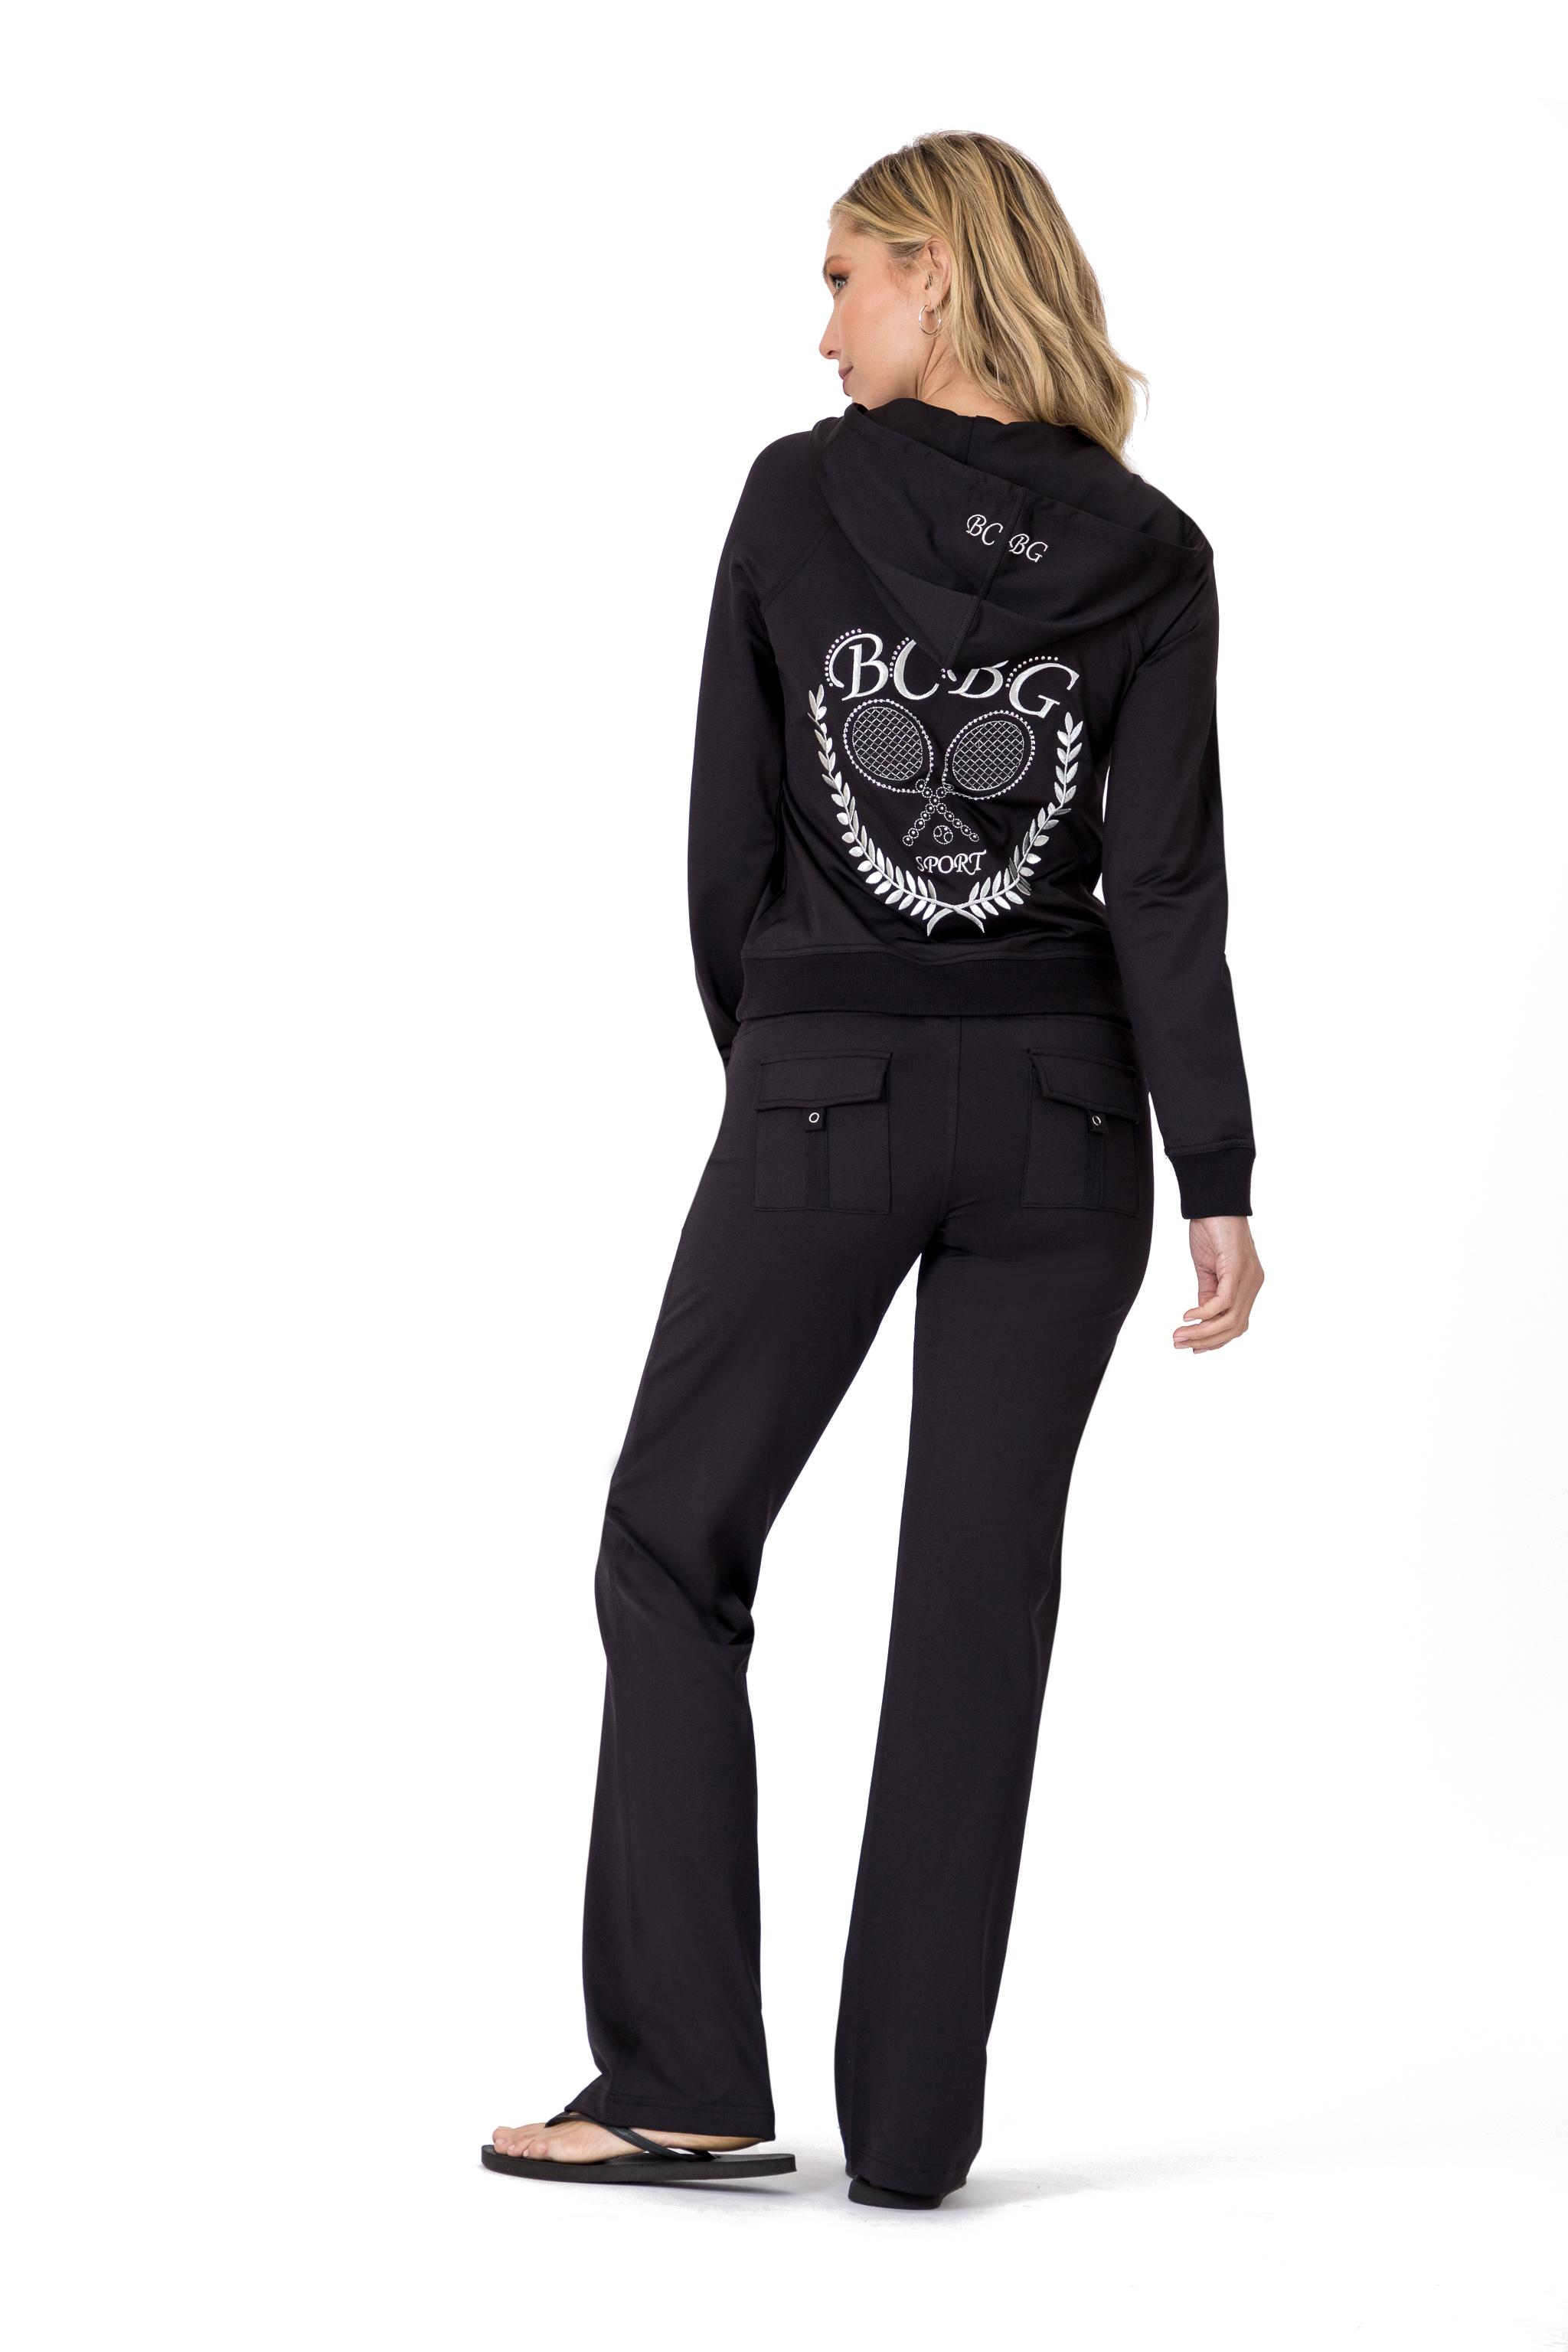 BCBG-Women-039-s-Lounge-Wear-2-Piece-Embellished-Jacket-and-Pants-Jogger-Set thumbnail 27